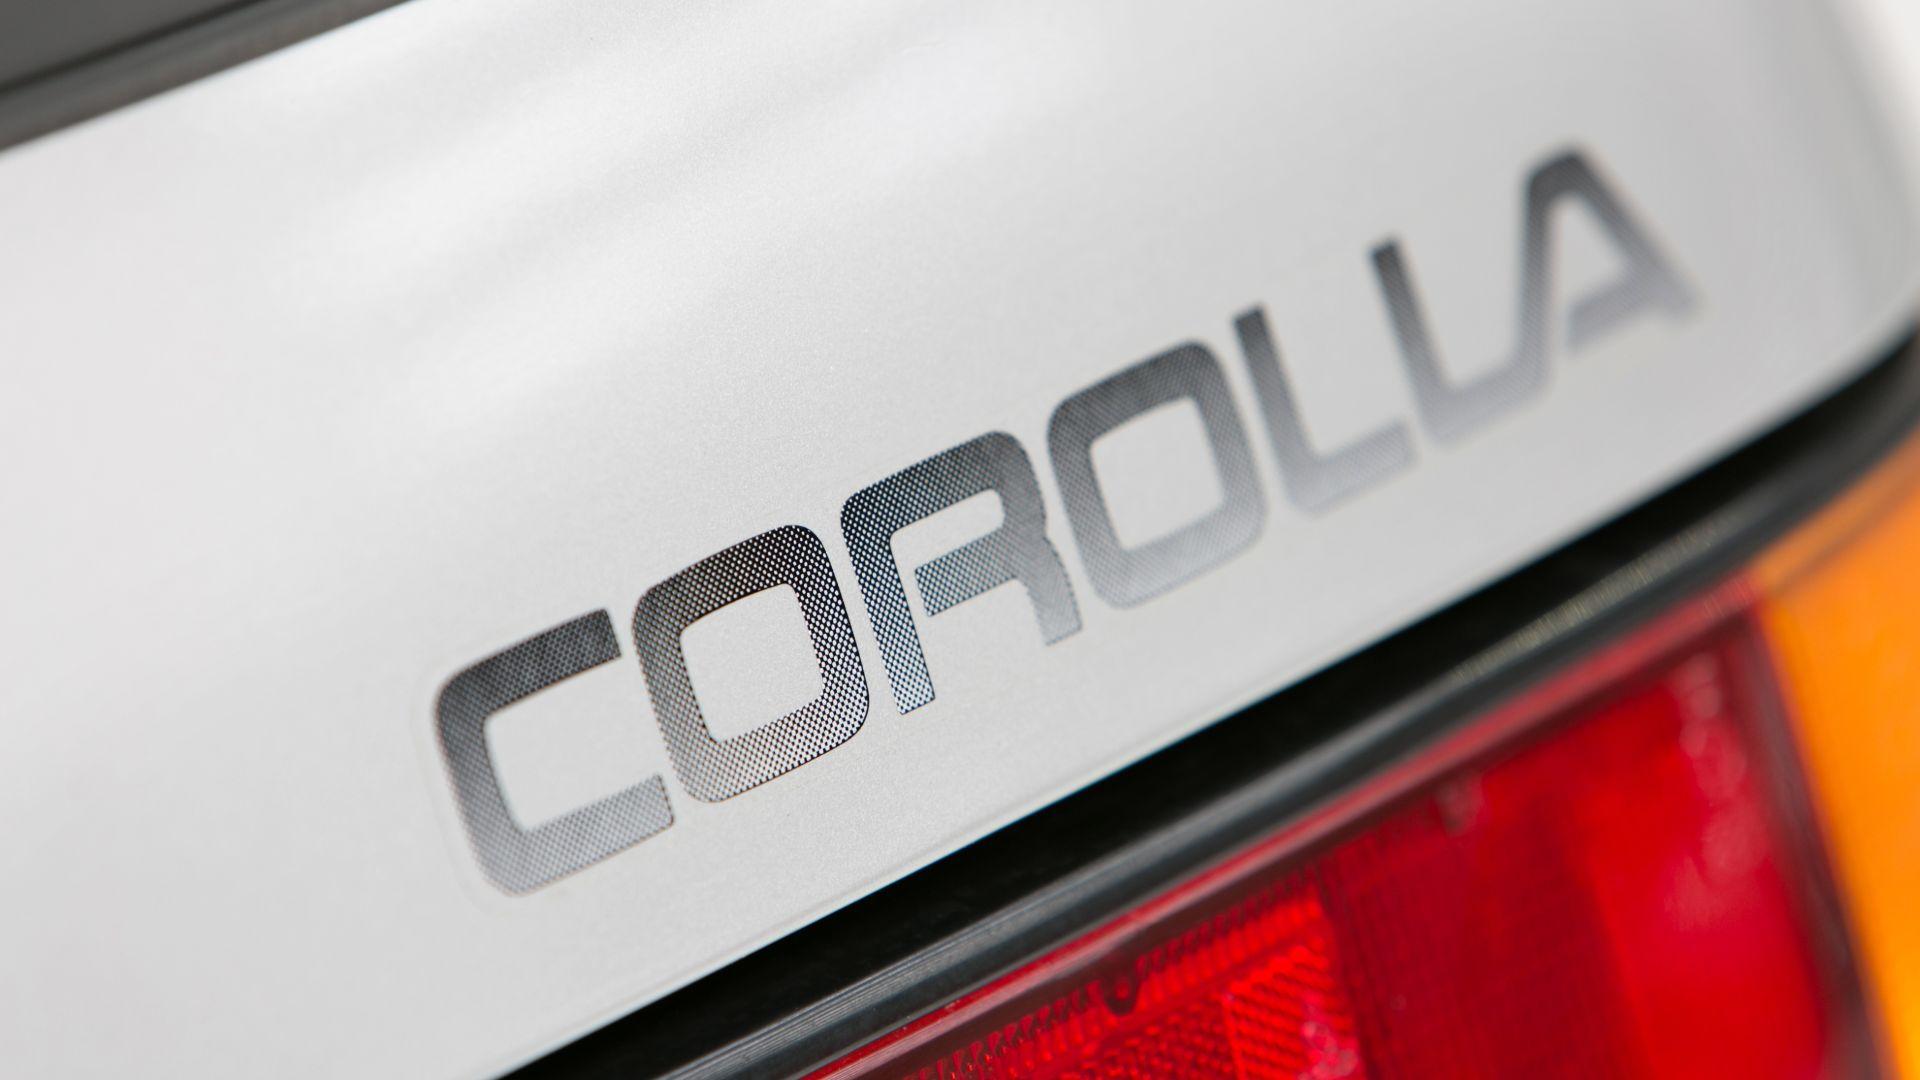 Toyota Corolla GT AE86